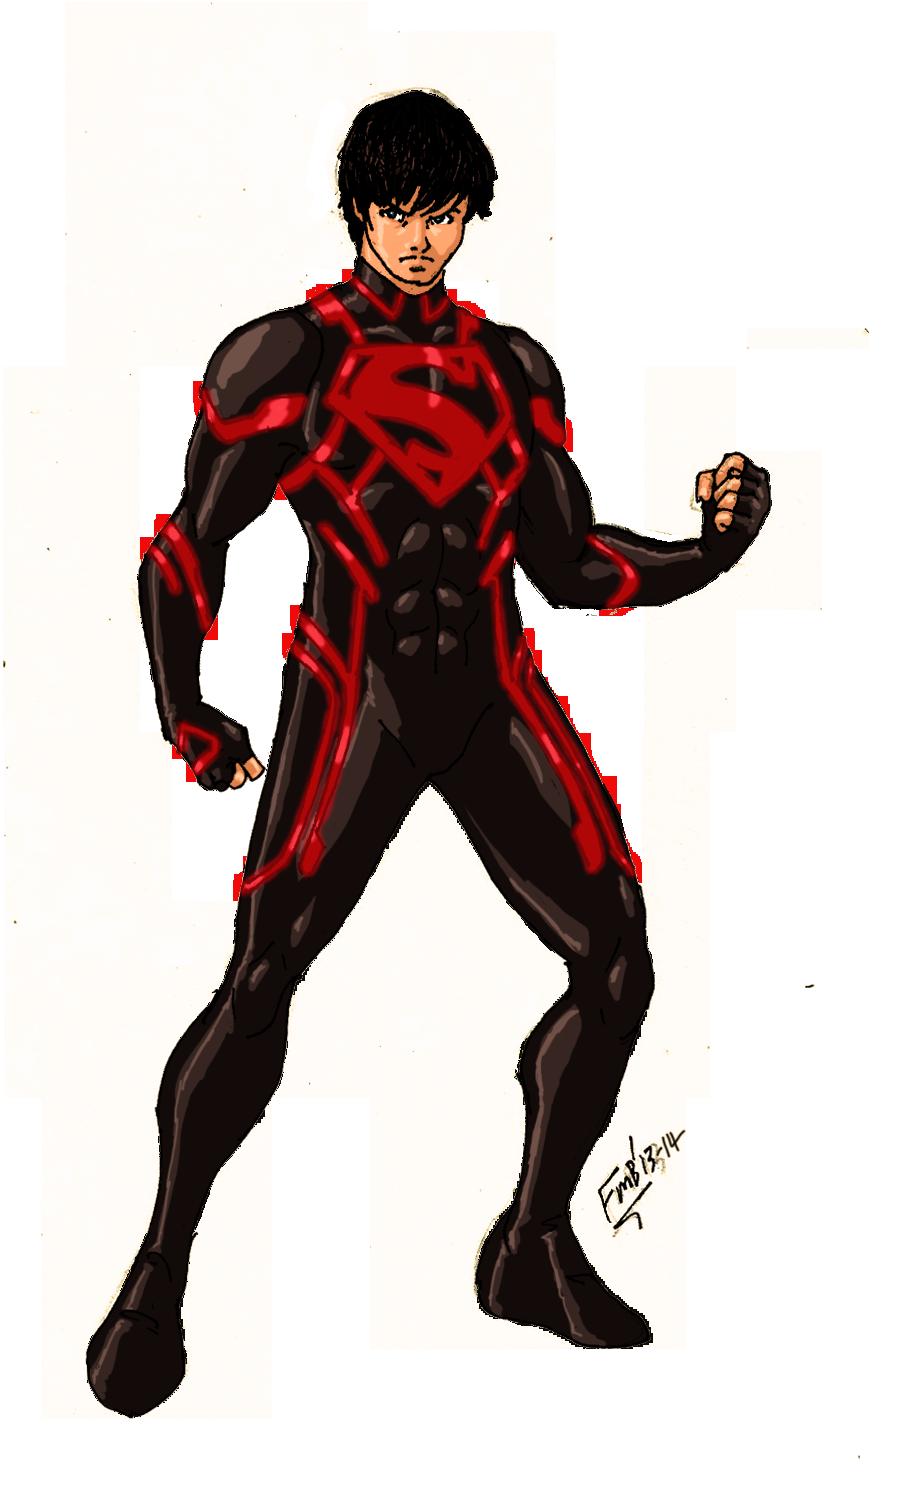 New 52: Superboy by kyomusha on DeviantArt